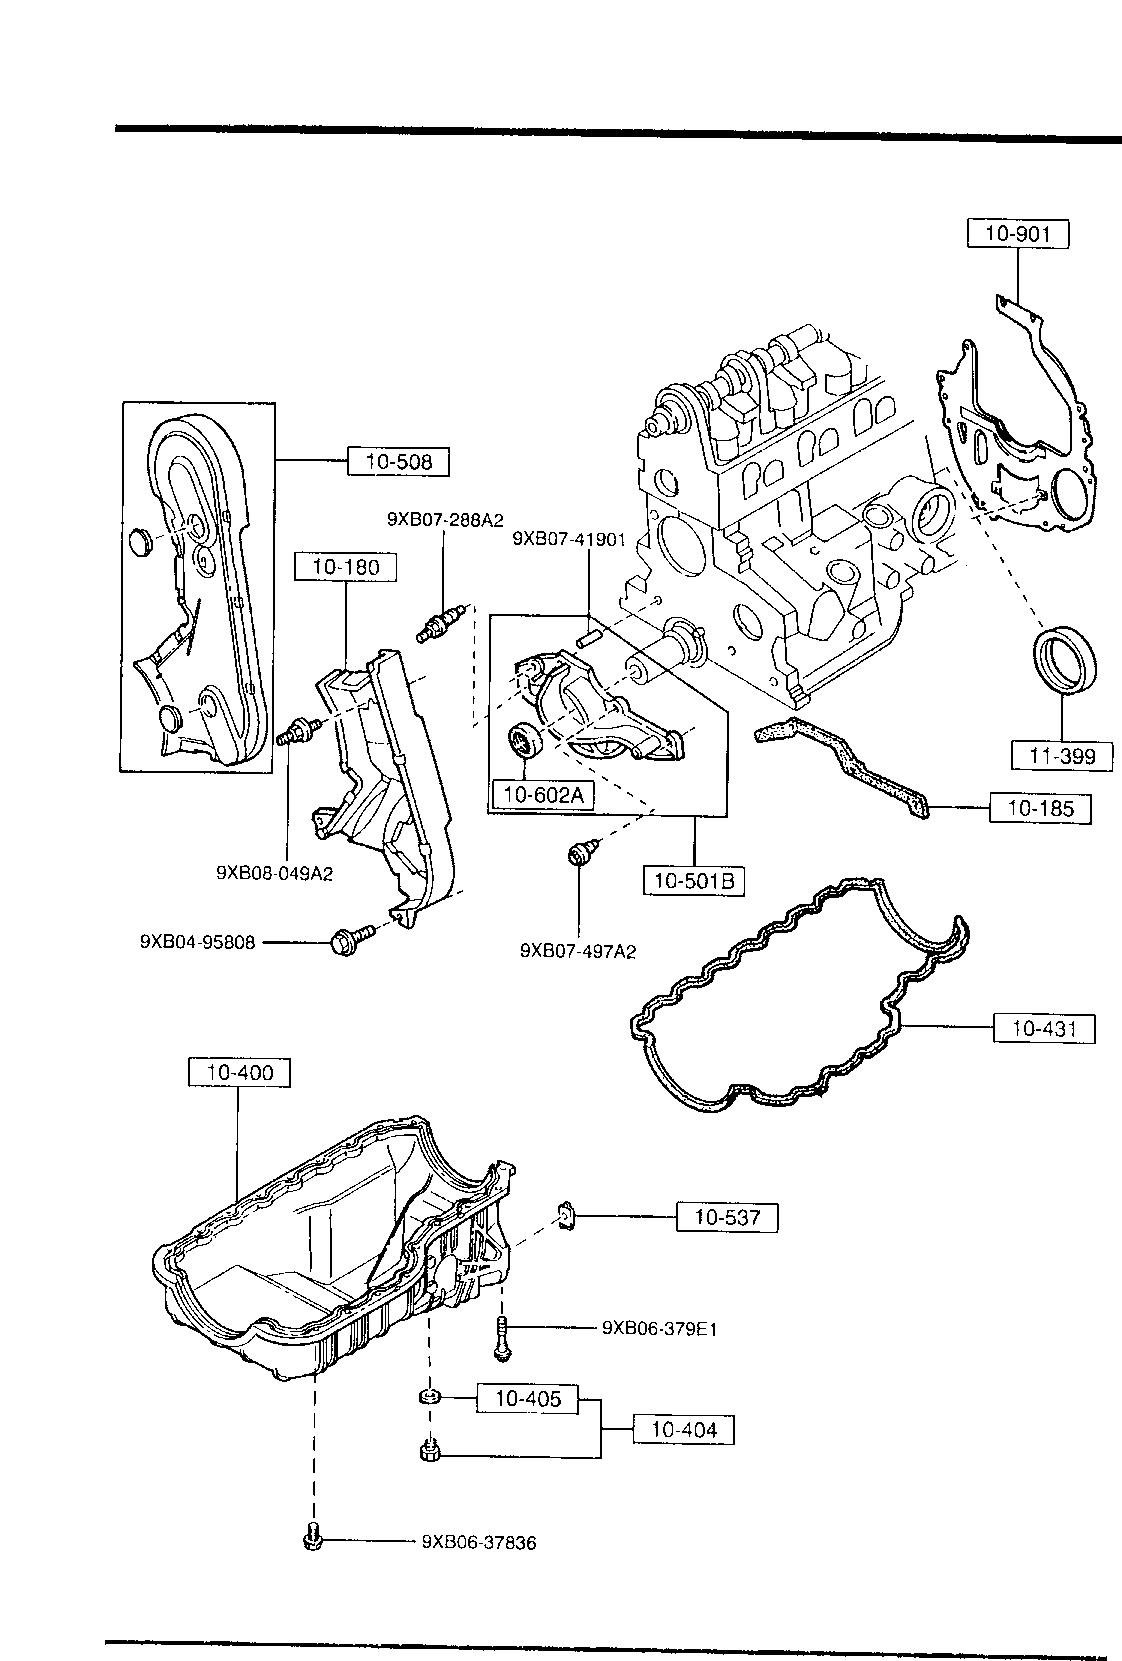 Motorcraft TS213 Constant Velocity Joint Shaft